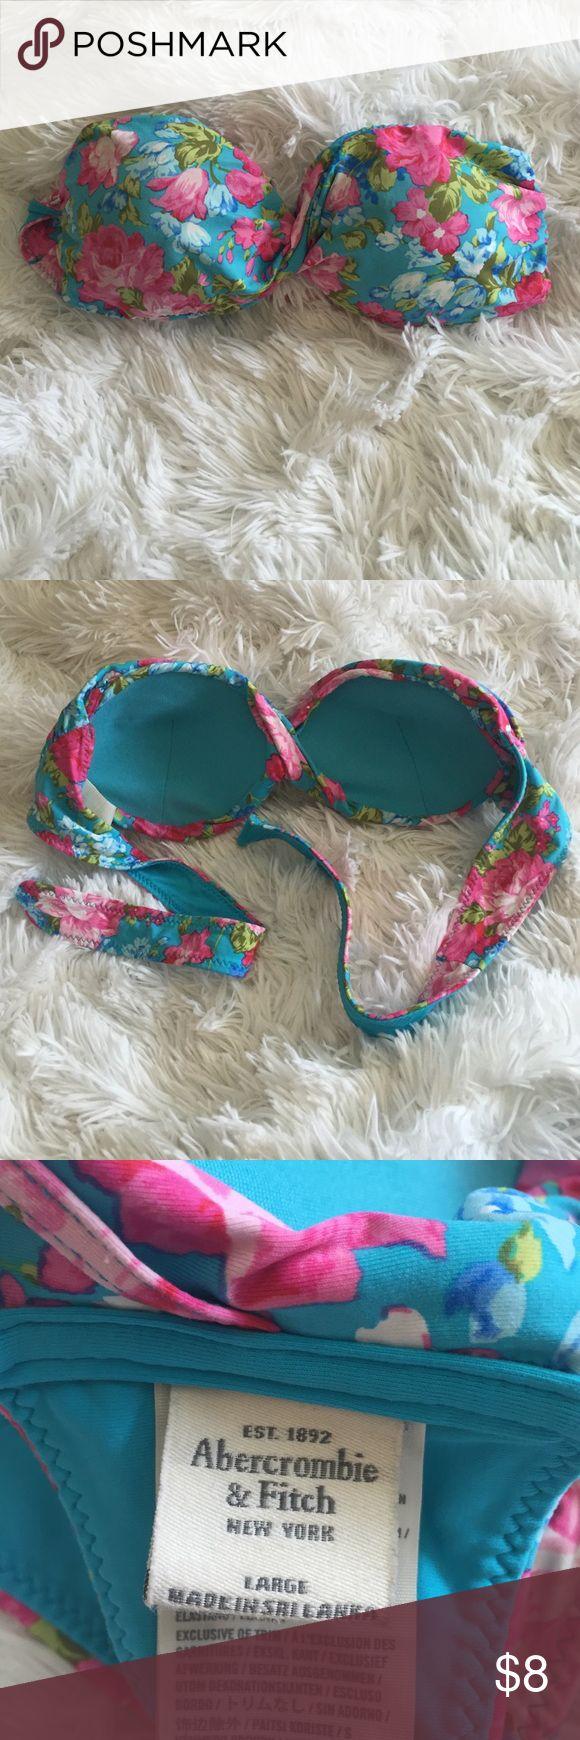 Abercrombie & Fitch Floral Bandeau Bikini Top Abercrombie & Fitch floral twist front strapless bikini top with a tie back. No push-up. Abercrombie & Fitch Swim Bikinis